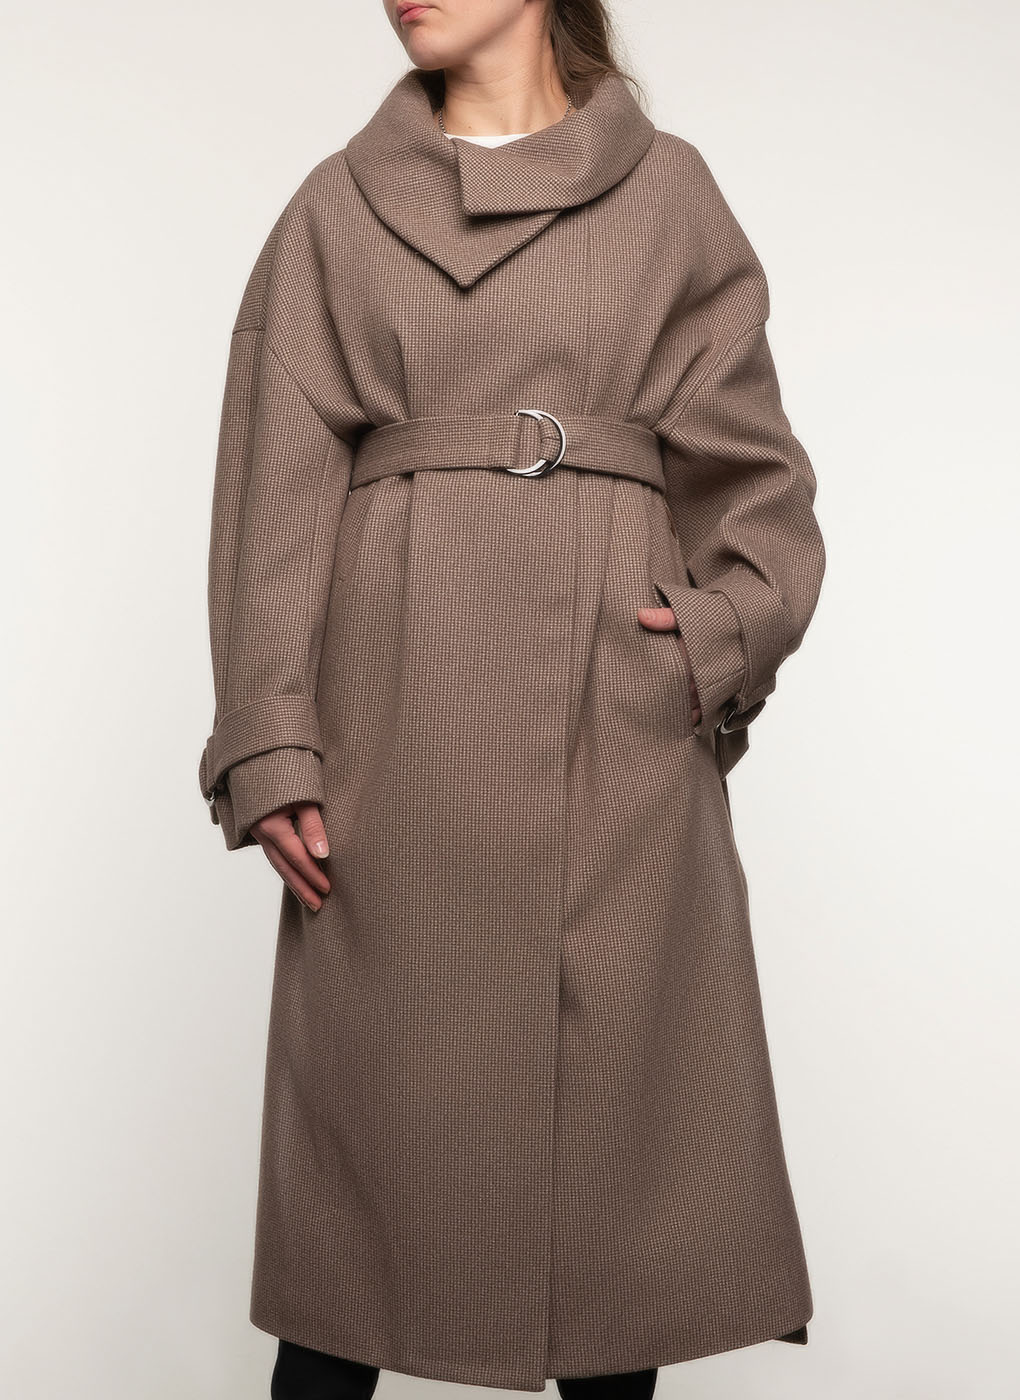 Пальто полушерстяное 111, idekka фото